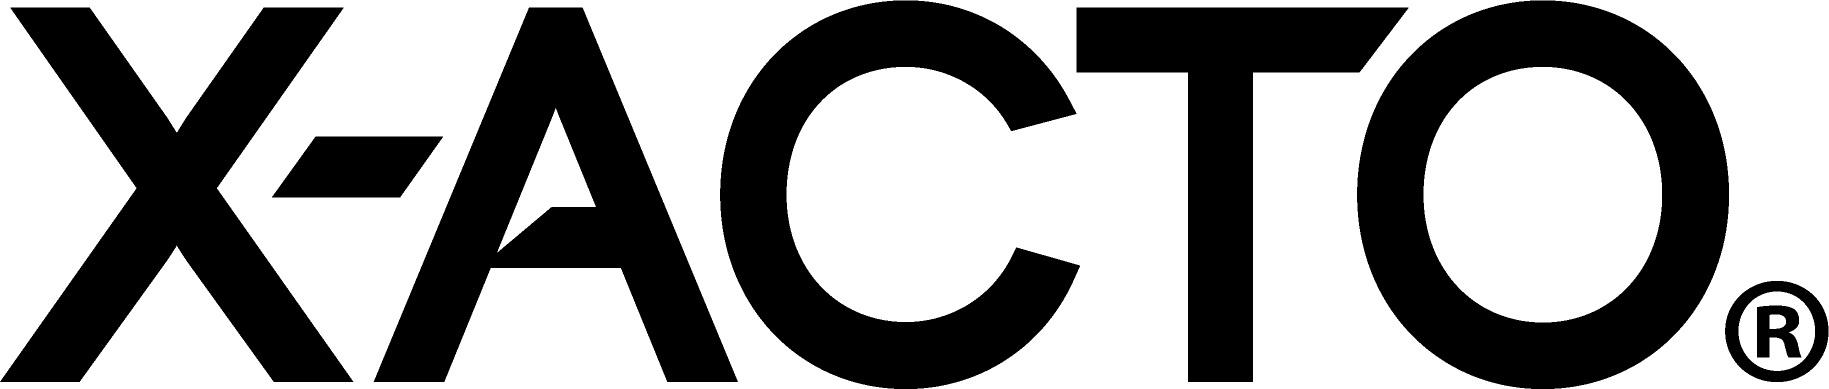 X-Acto coupon codes